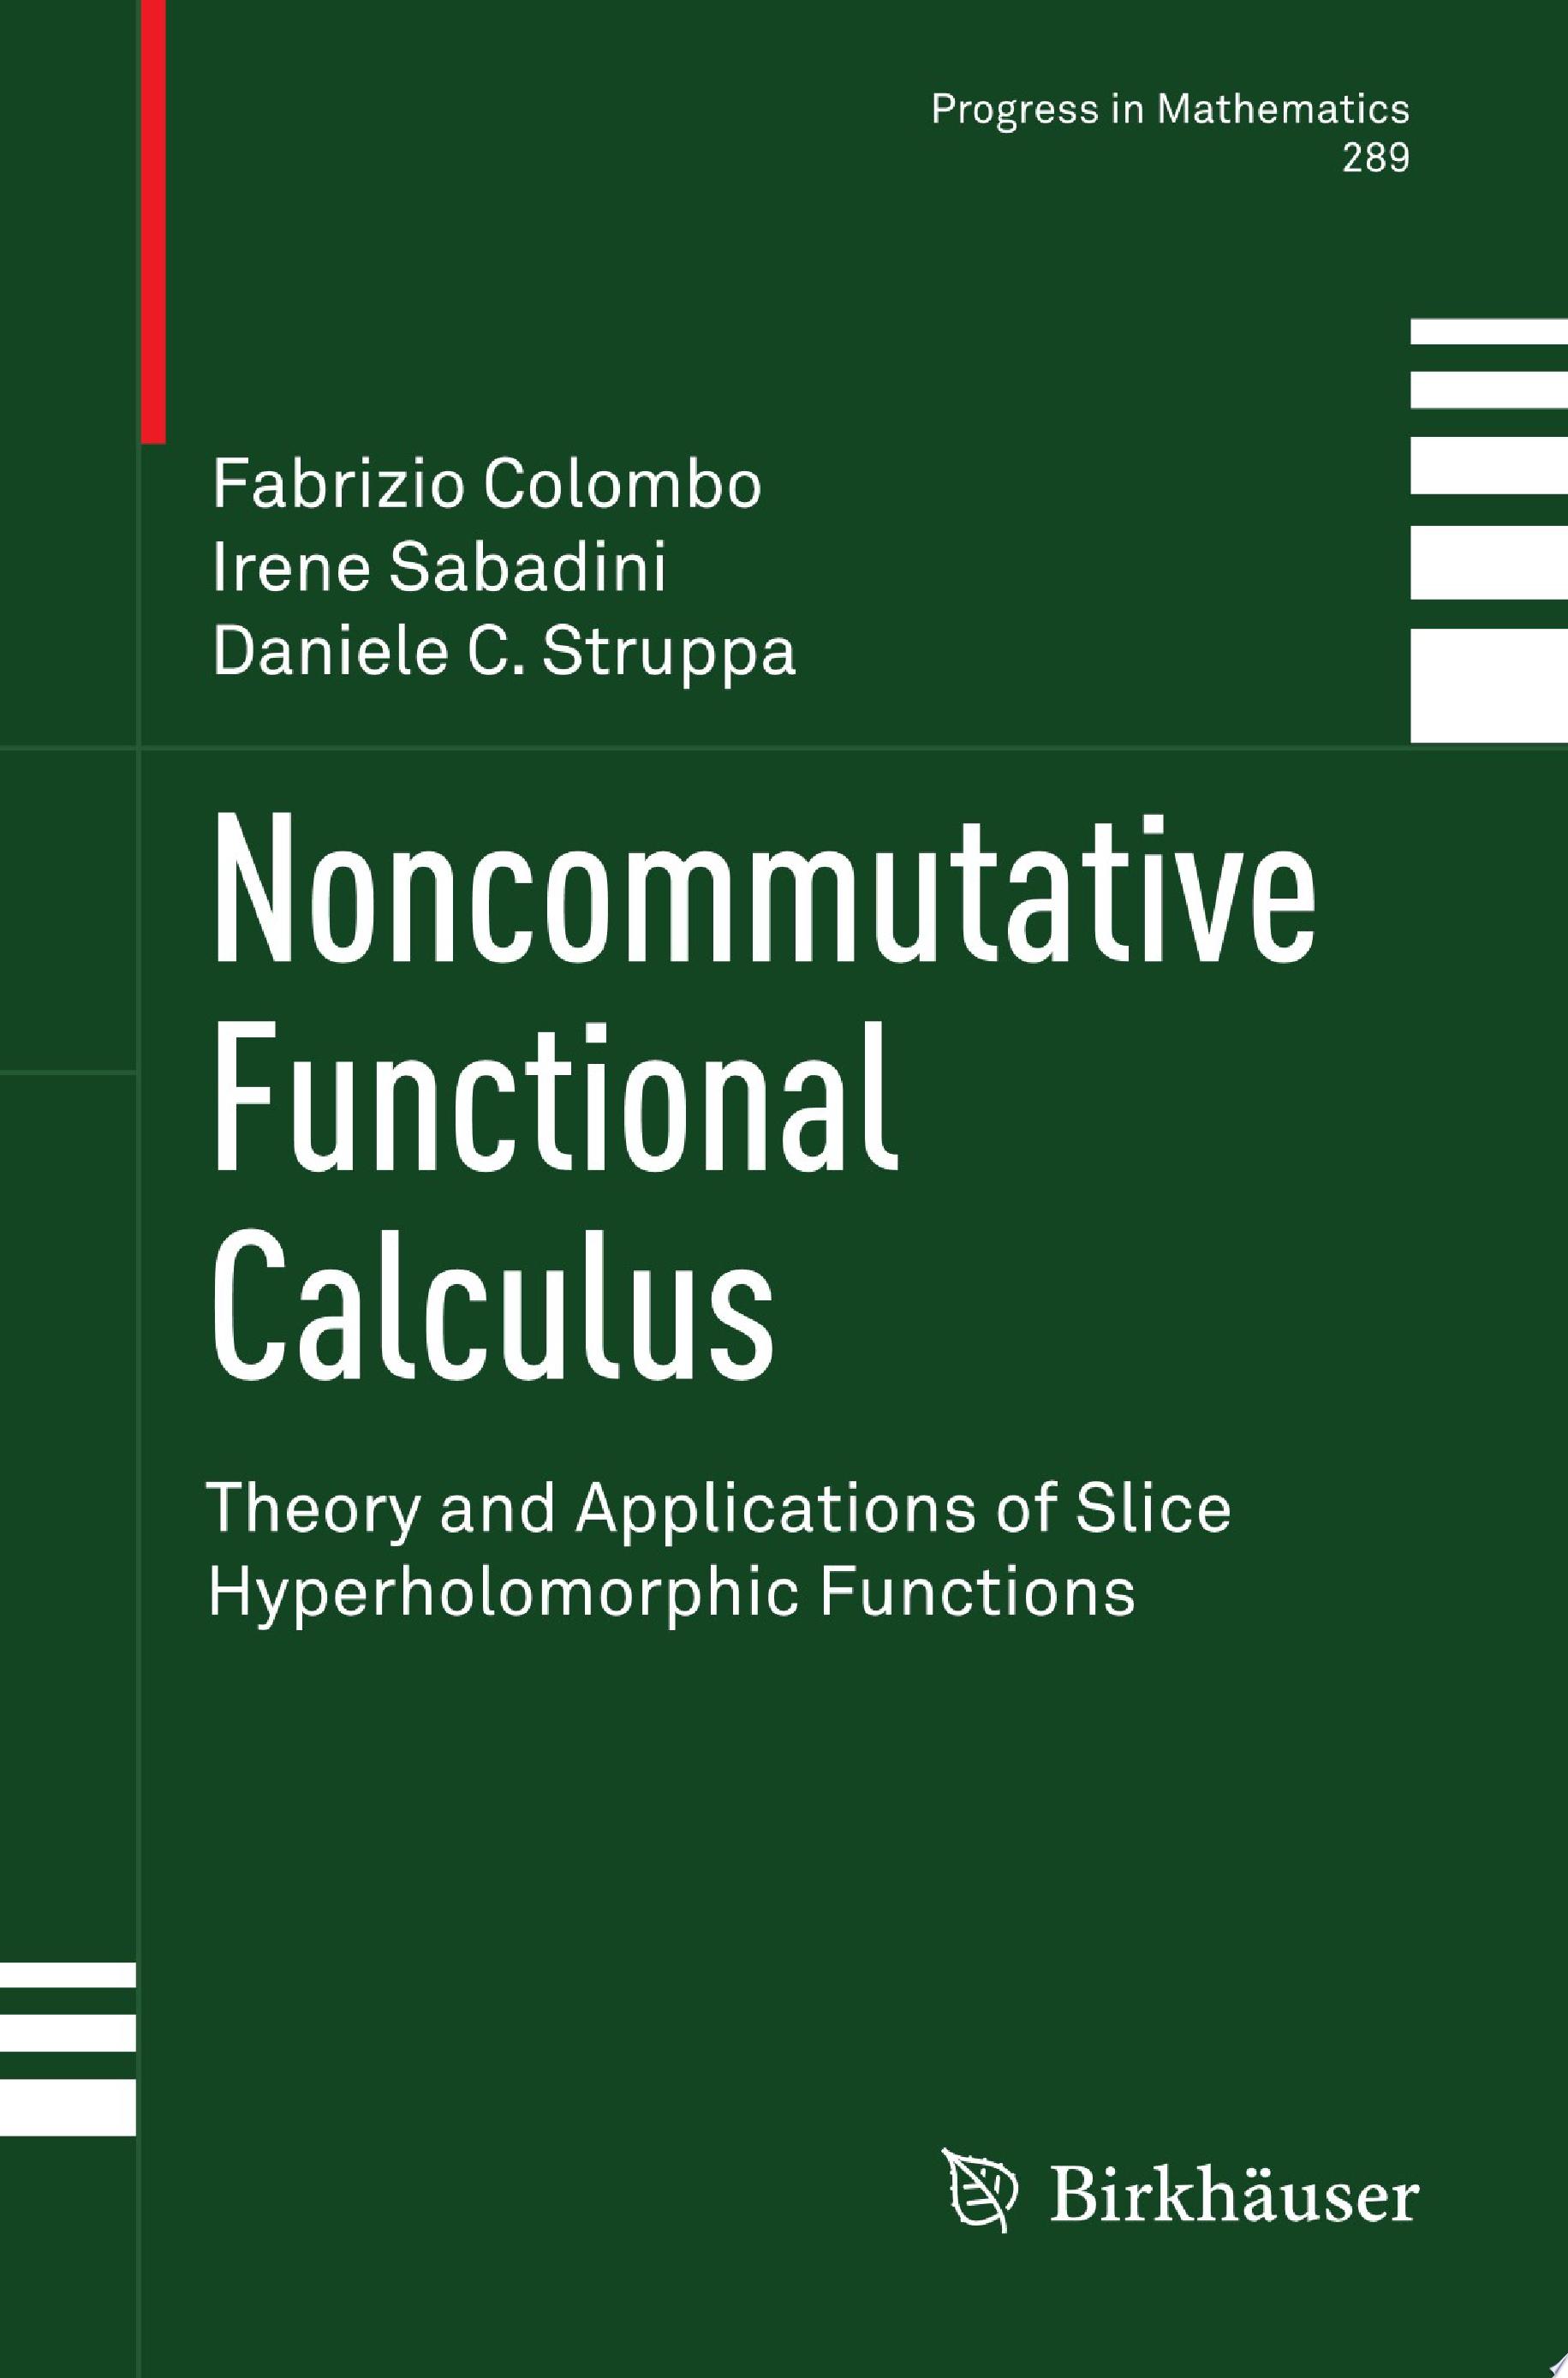 Noncommutative Functional Calculus